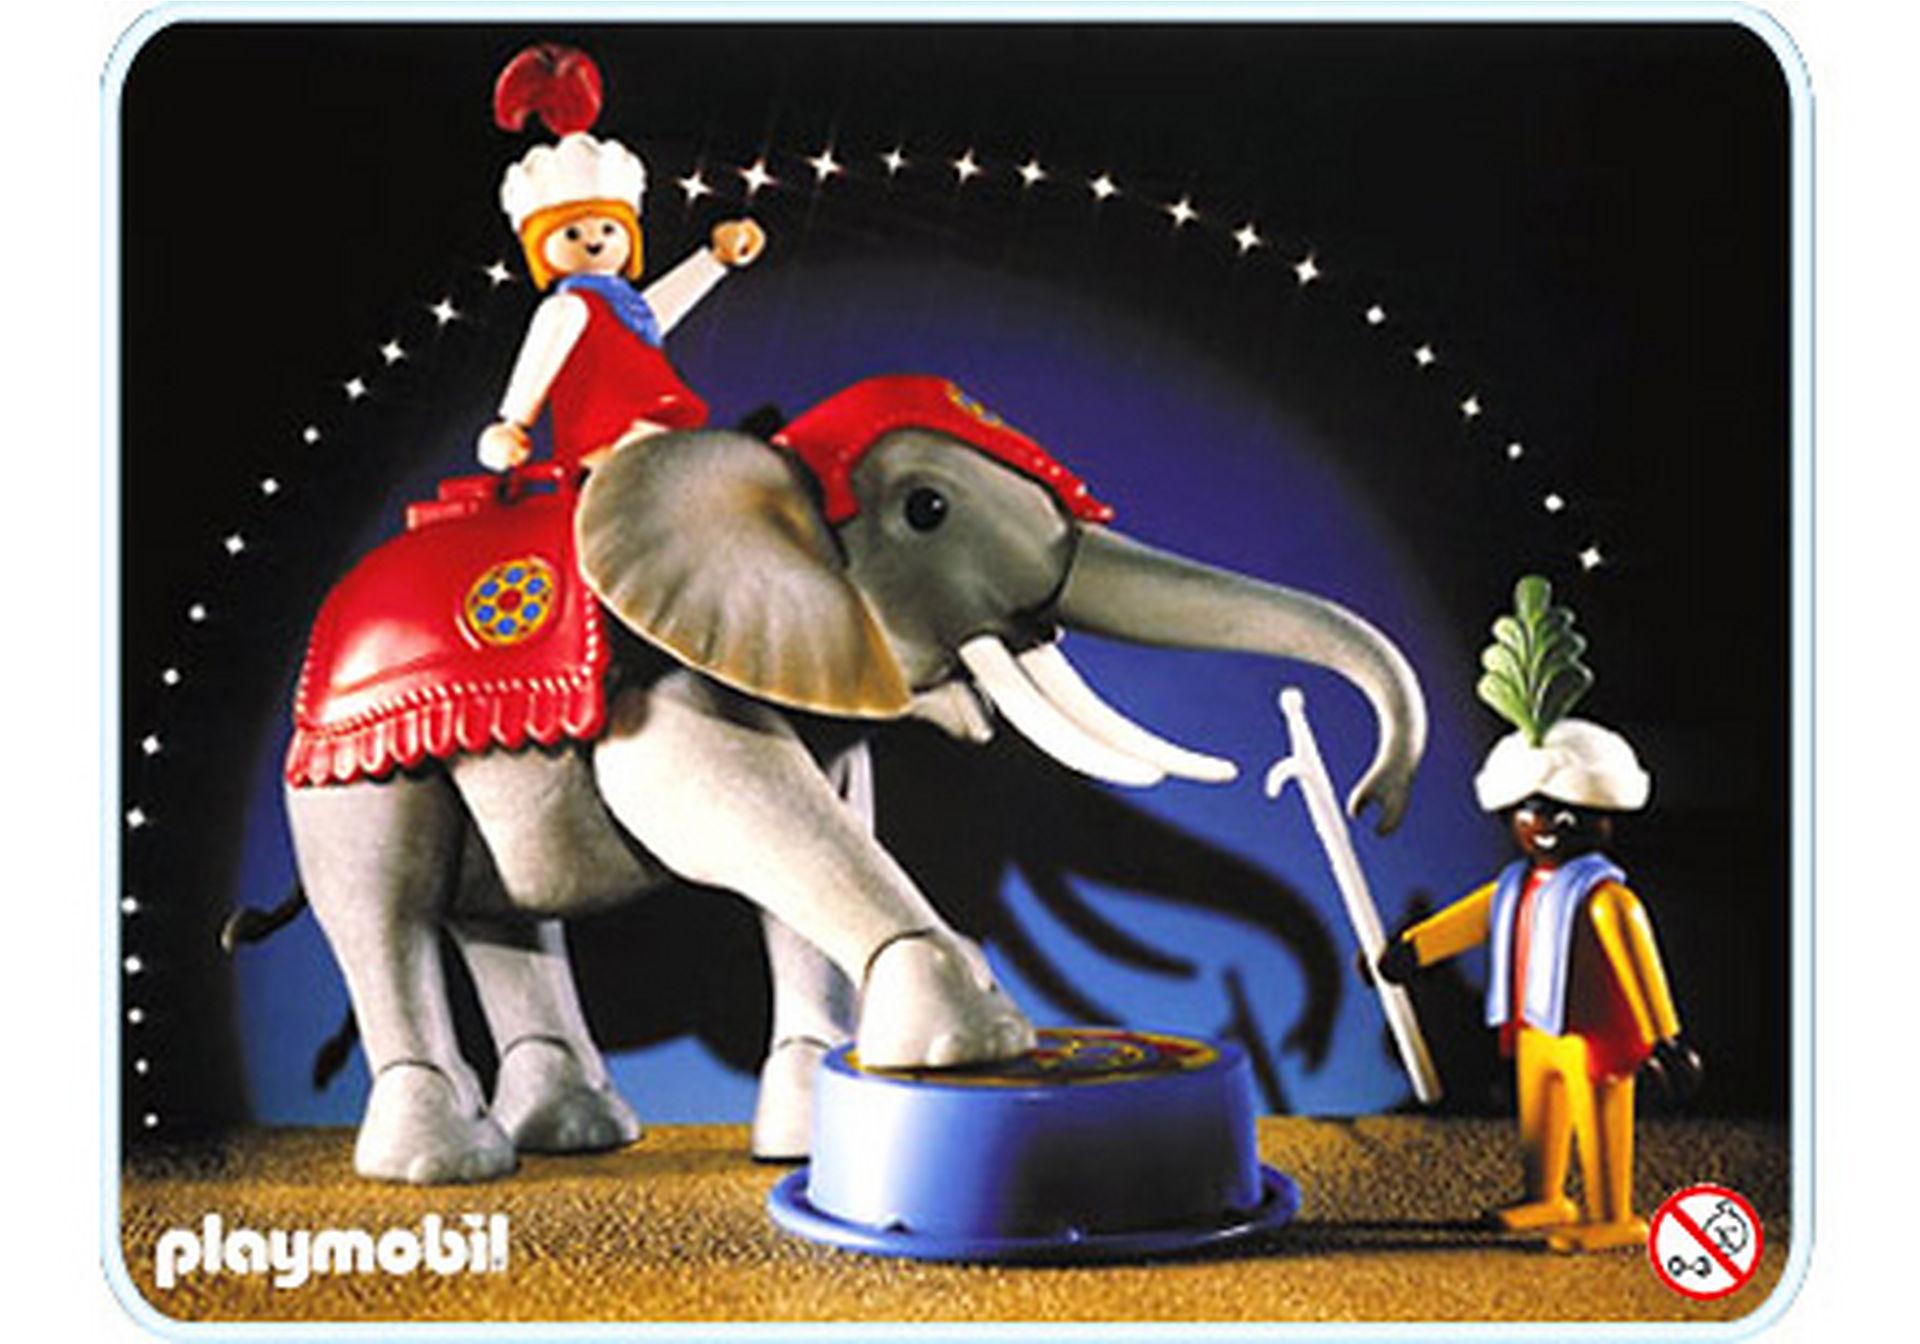 http://media.playmobil.com/i/playmobil/3711-A_product_detail/Eléphant de cirque et dresseur